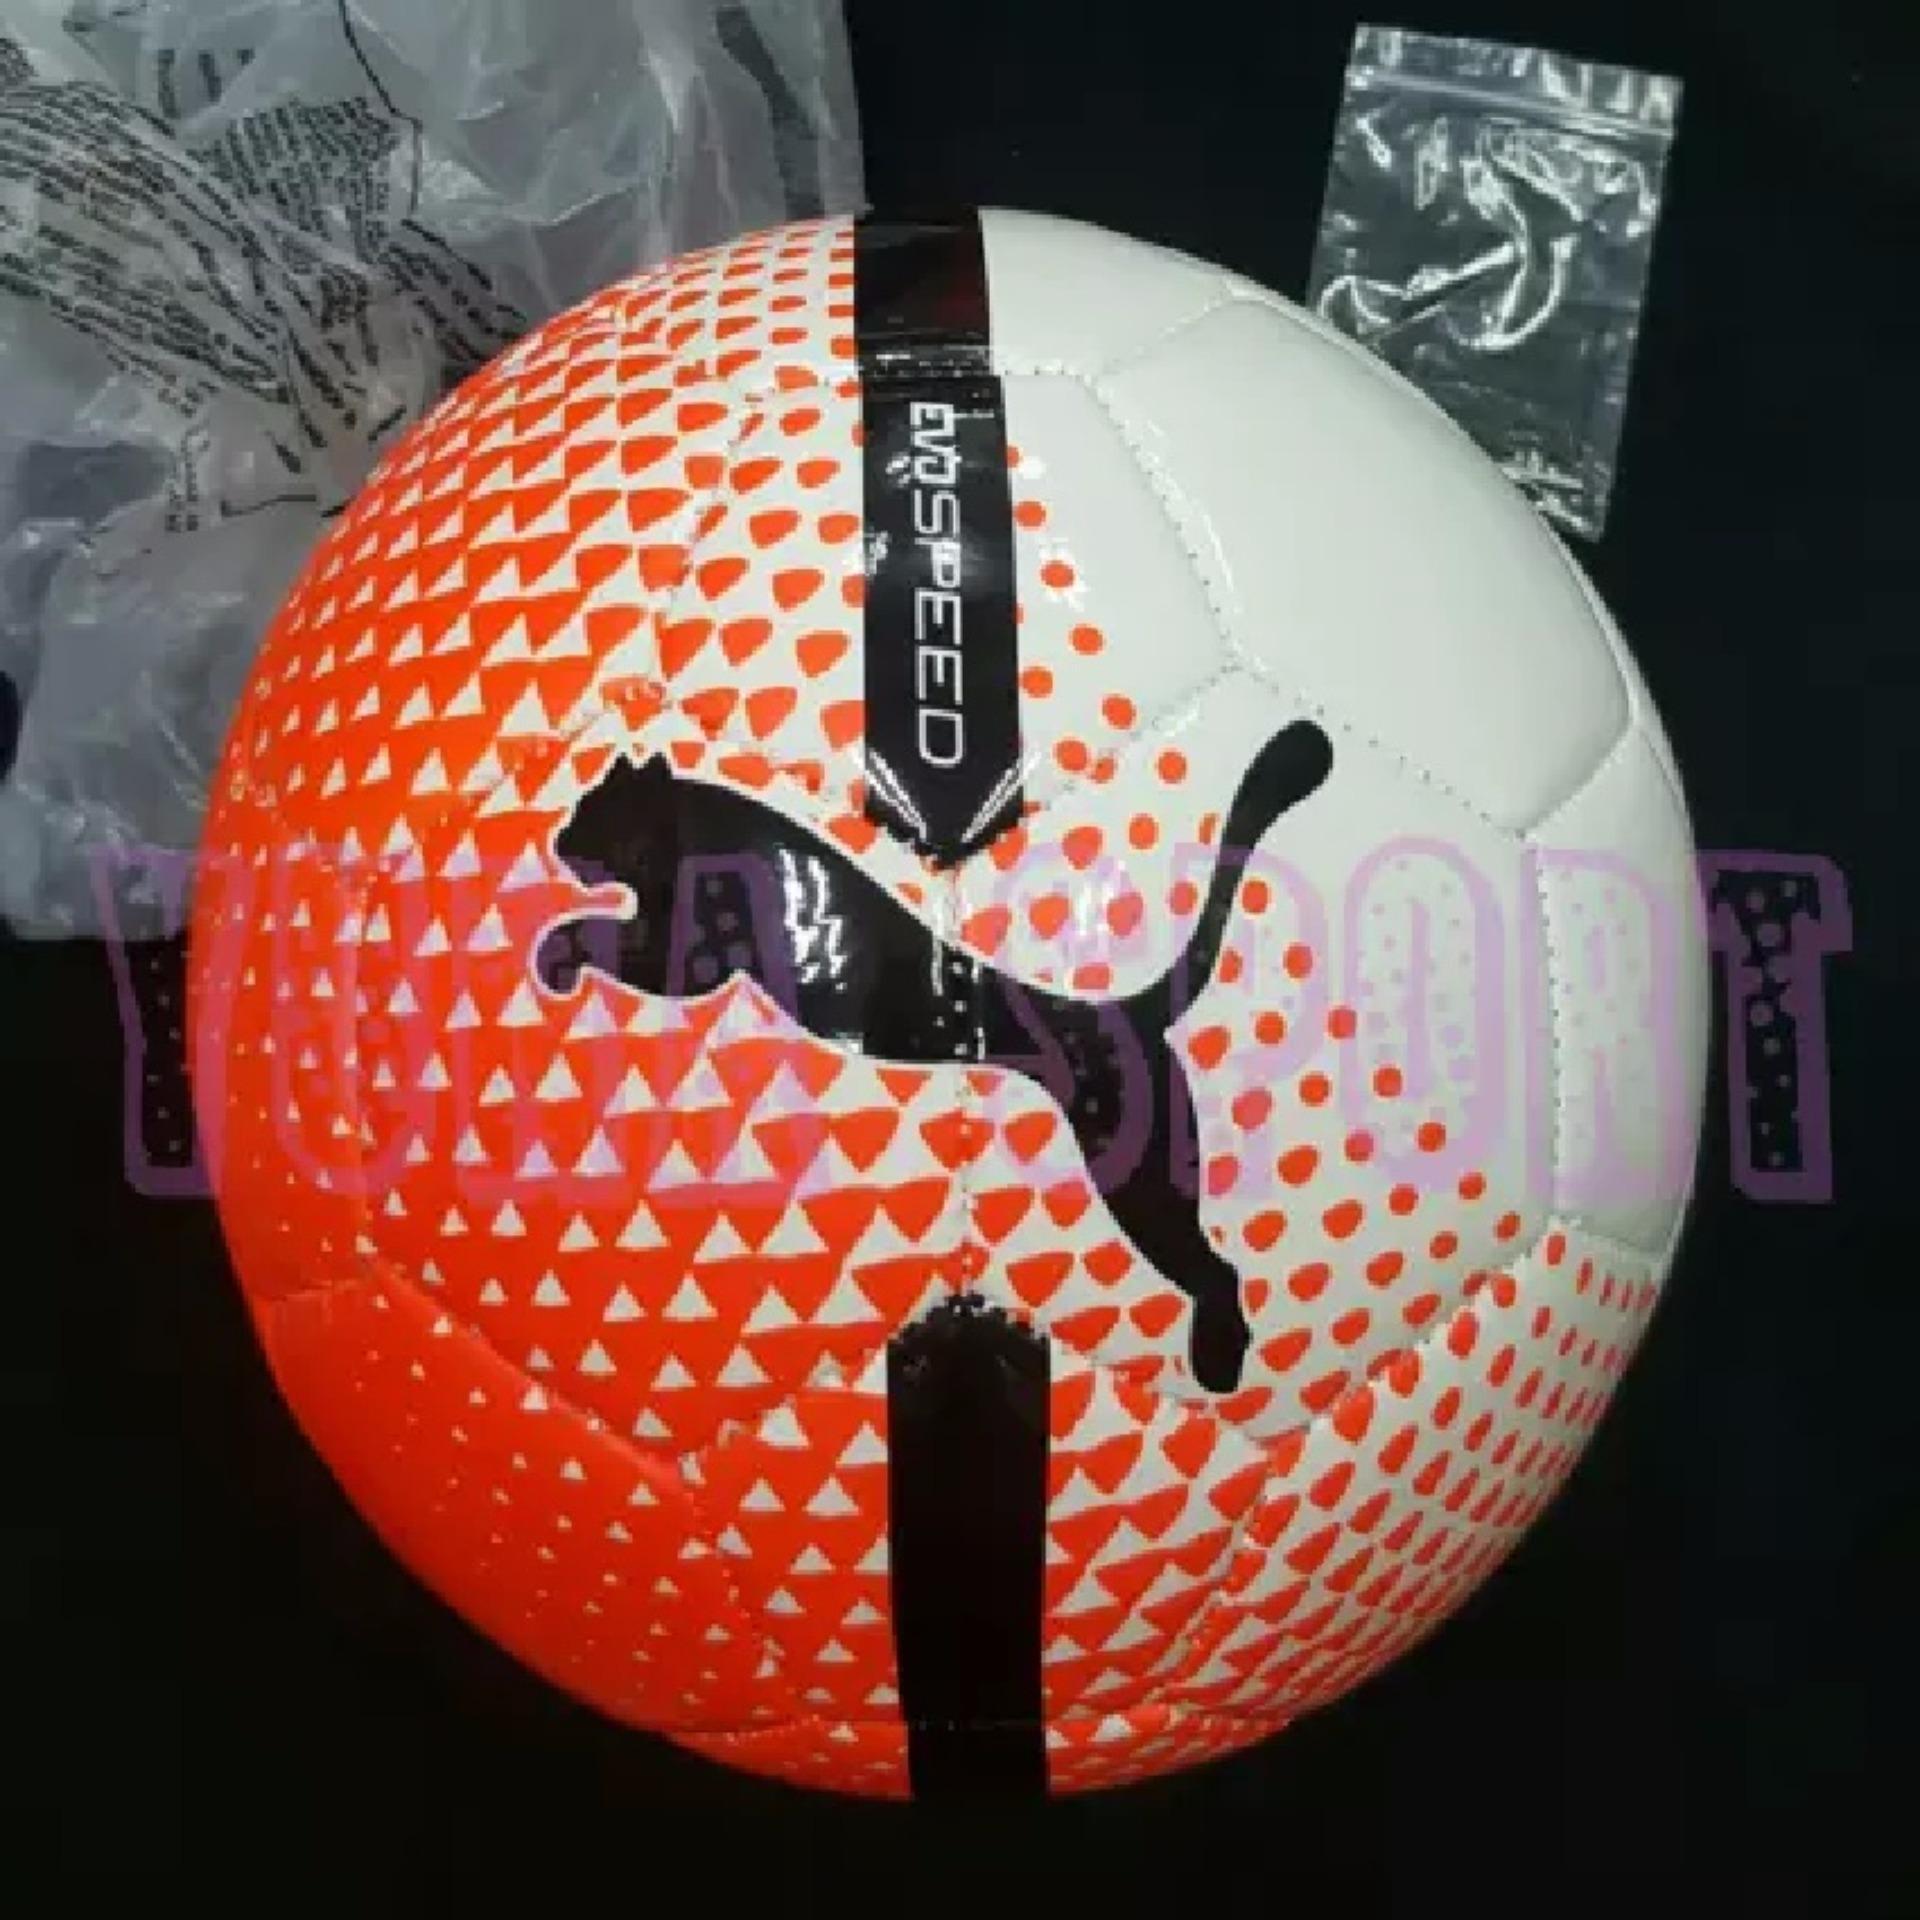 29967fac57 Mitre Titania Futsal No4 Multicolor Bola Futsal - Daftar Harga ...